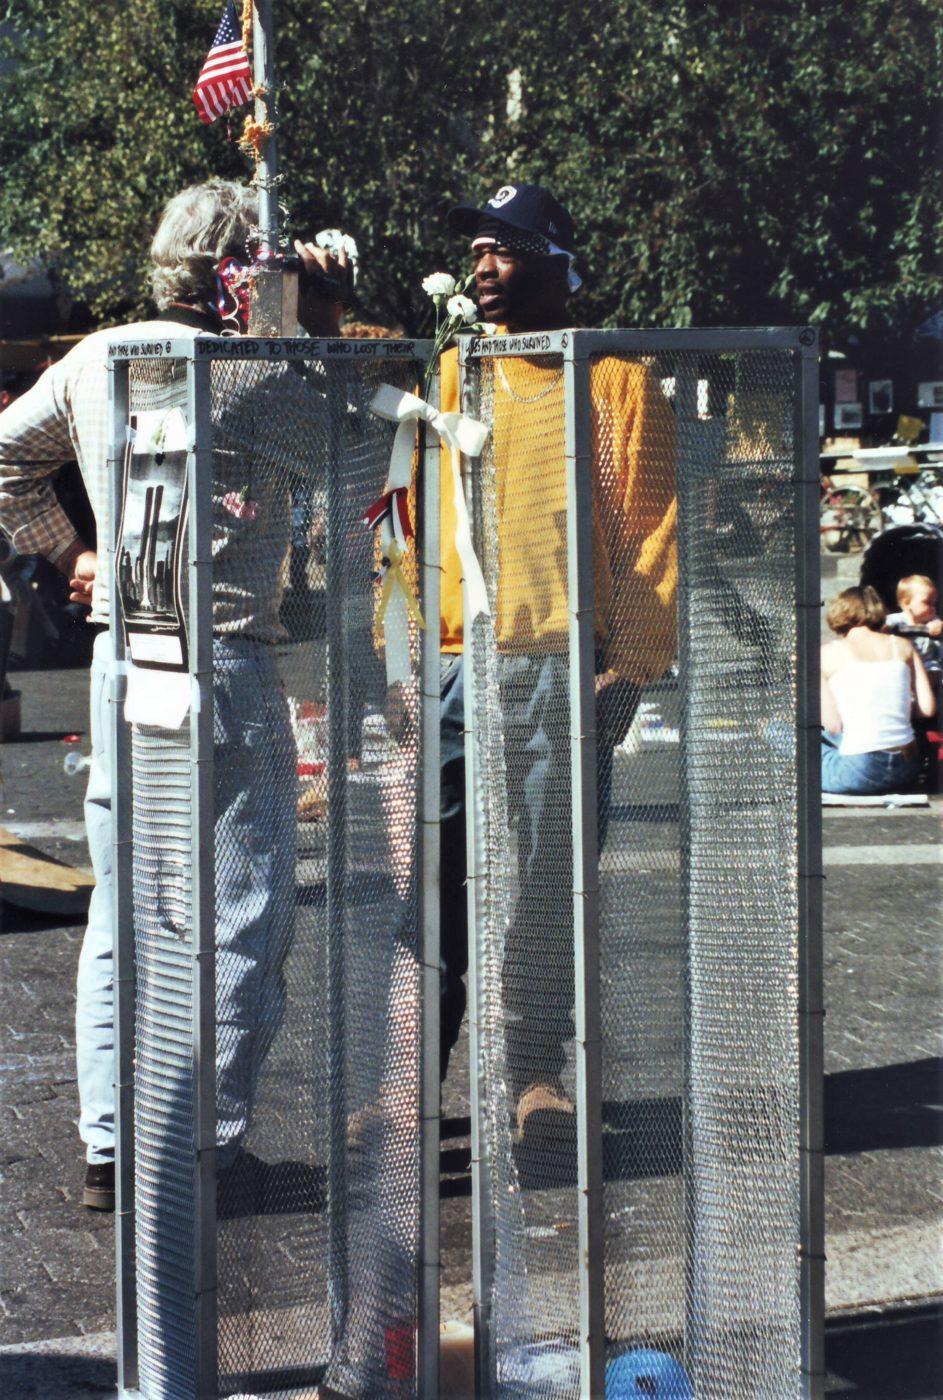 Marjorie Zien - 911 twin towers closeup at Union Sq memorial